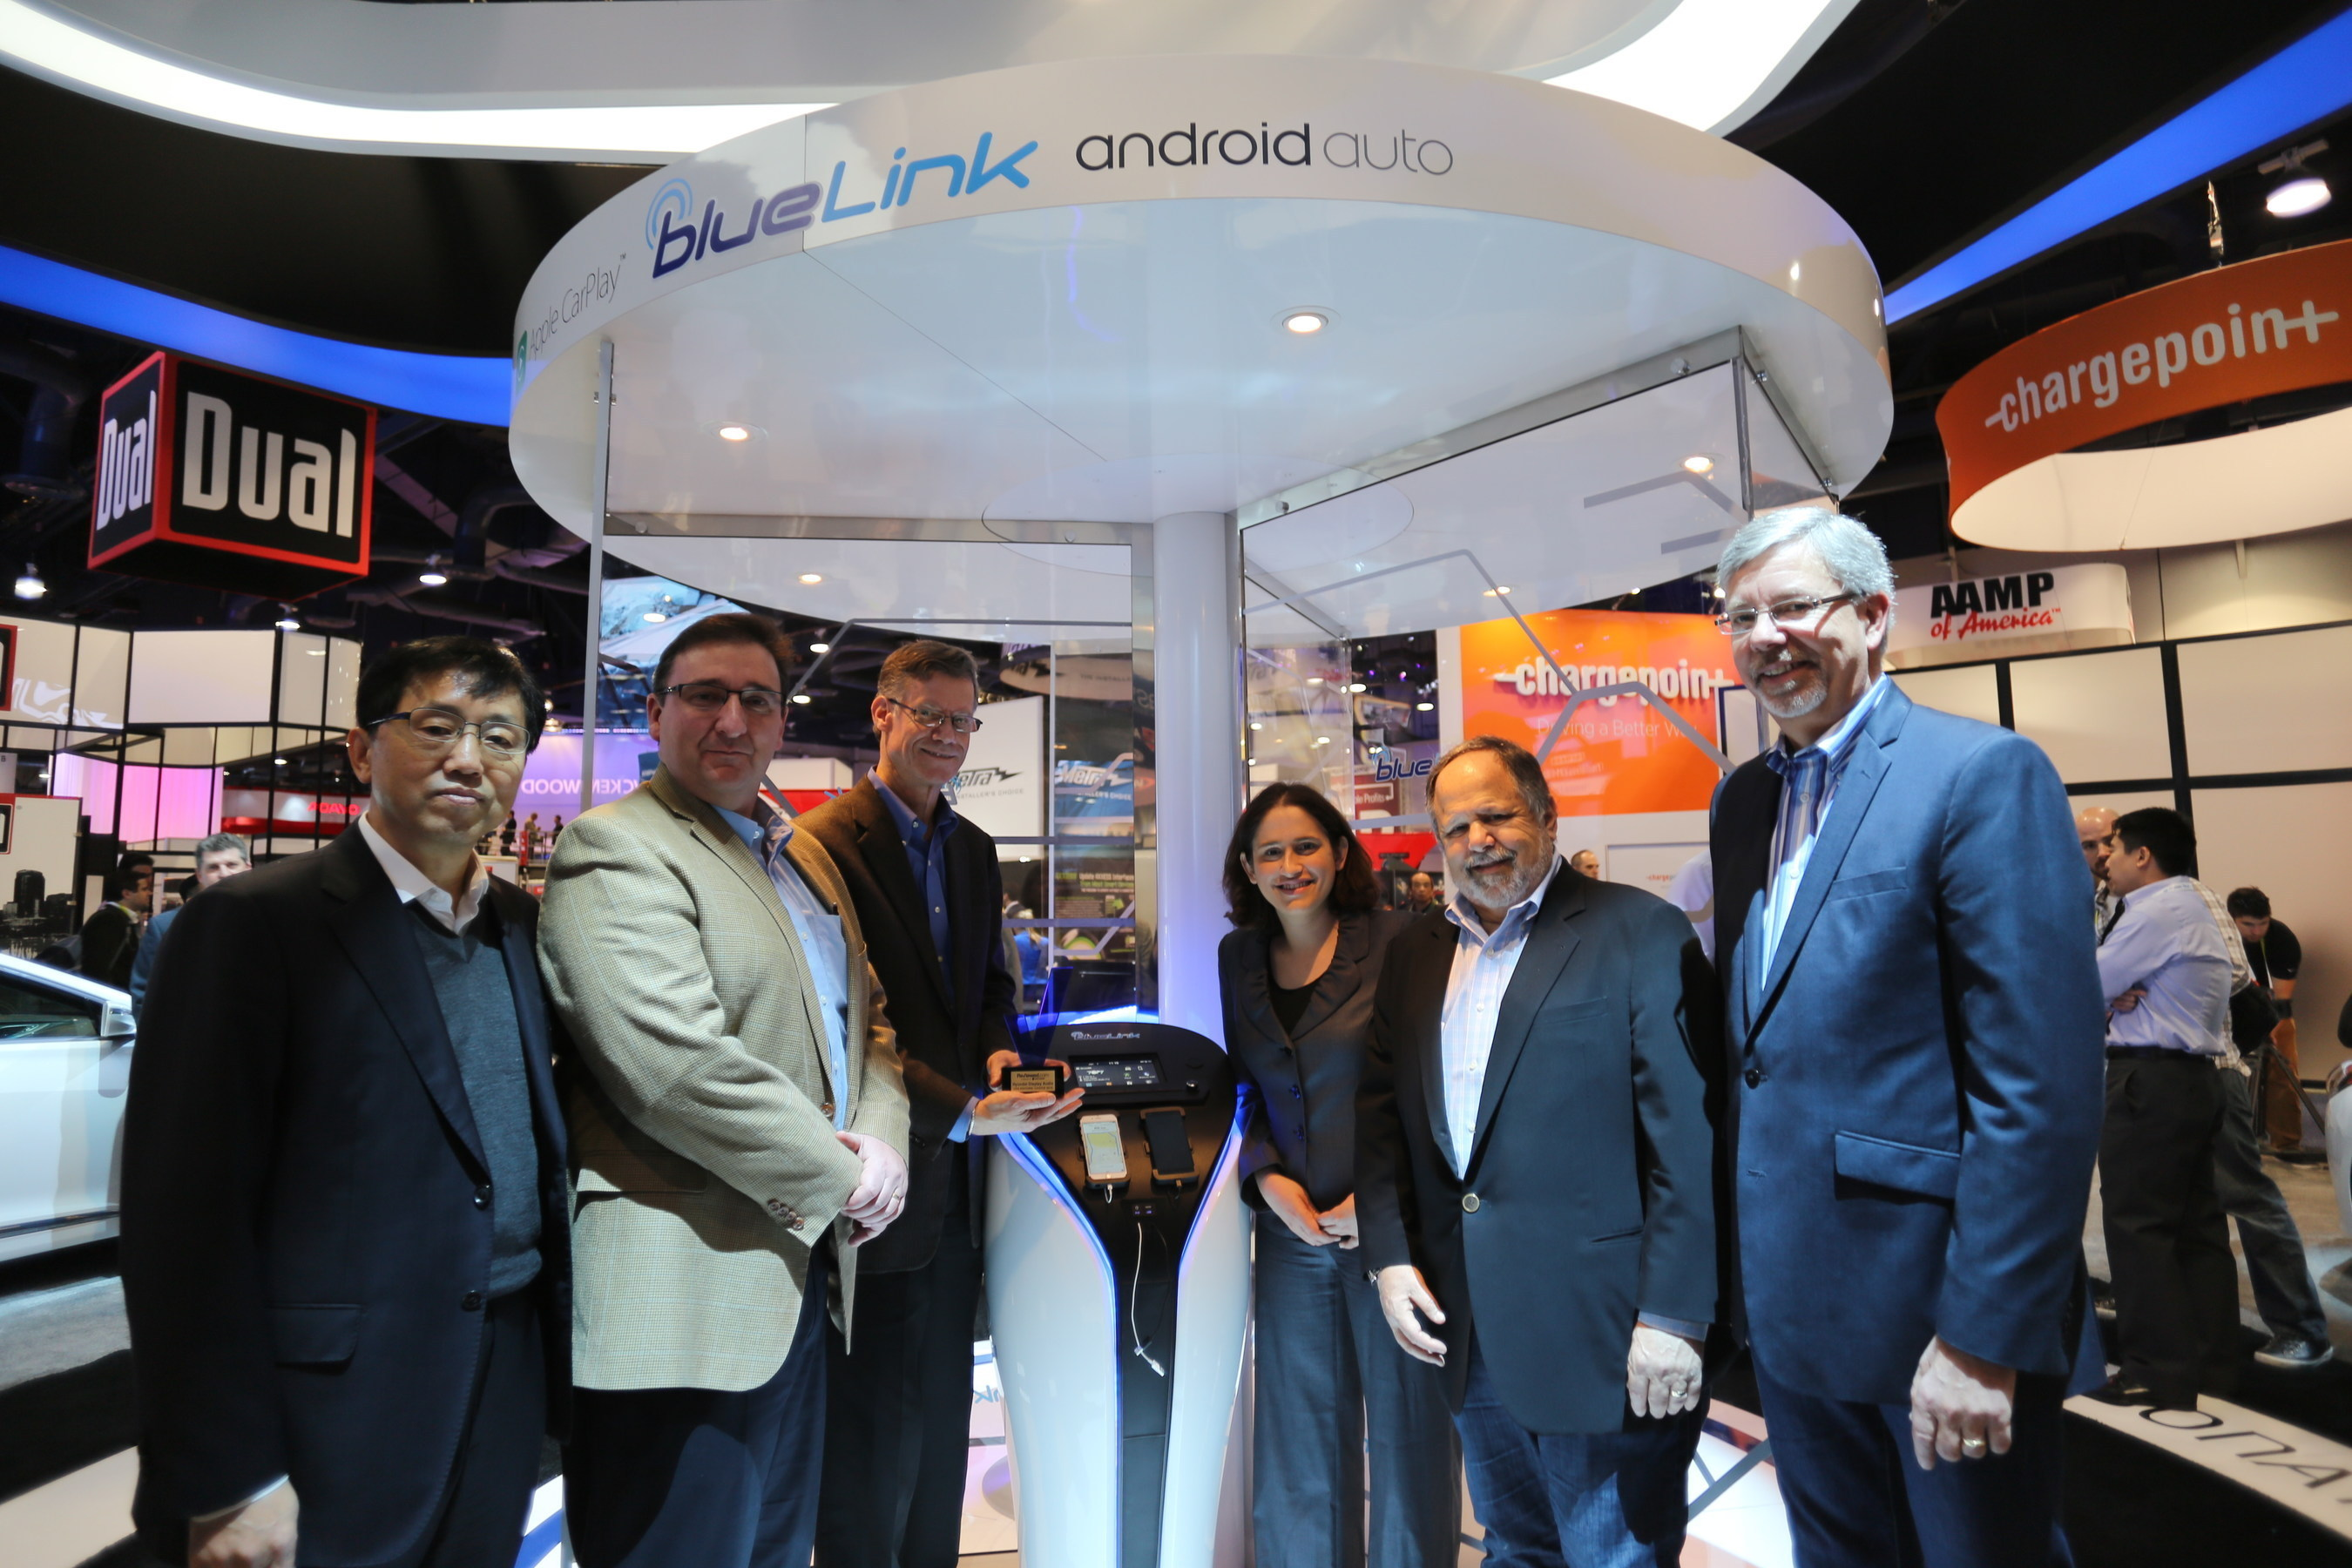 Reviewed.com/ USA TODAY Executives Present CES Editors' Choice Award for Hyundai Display Auto on January 7, 2015 in Las Vegas.